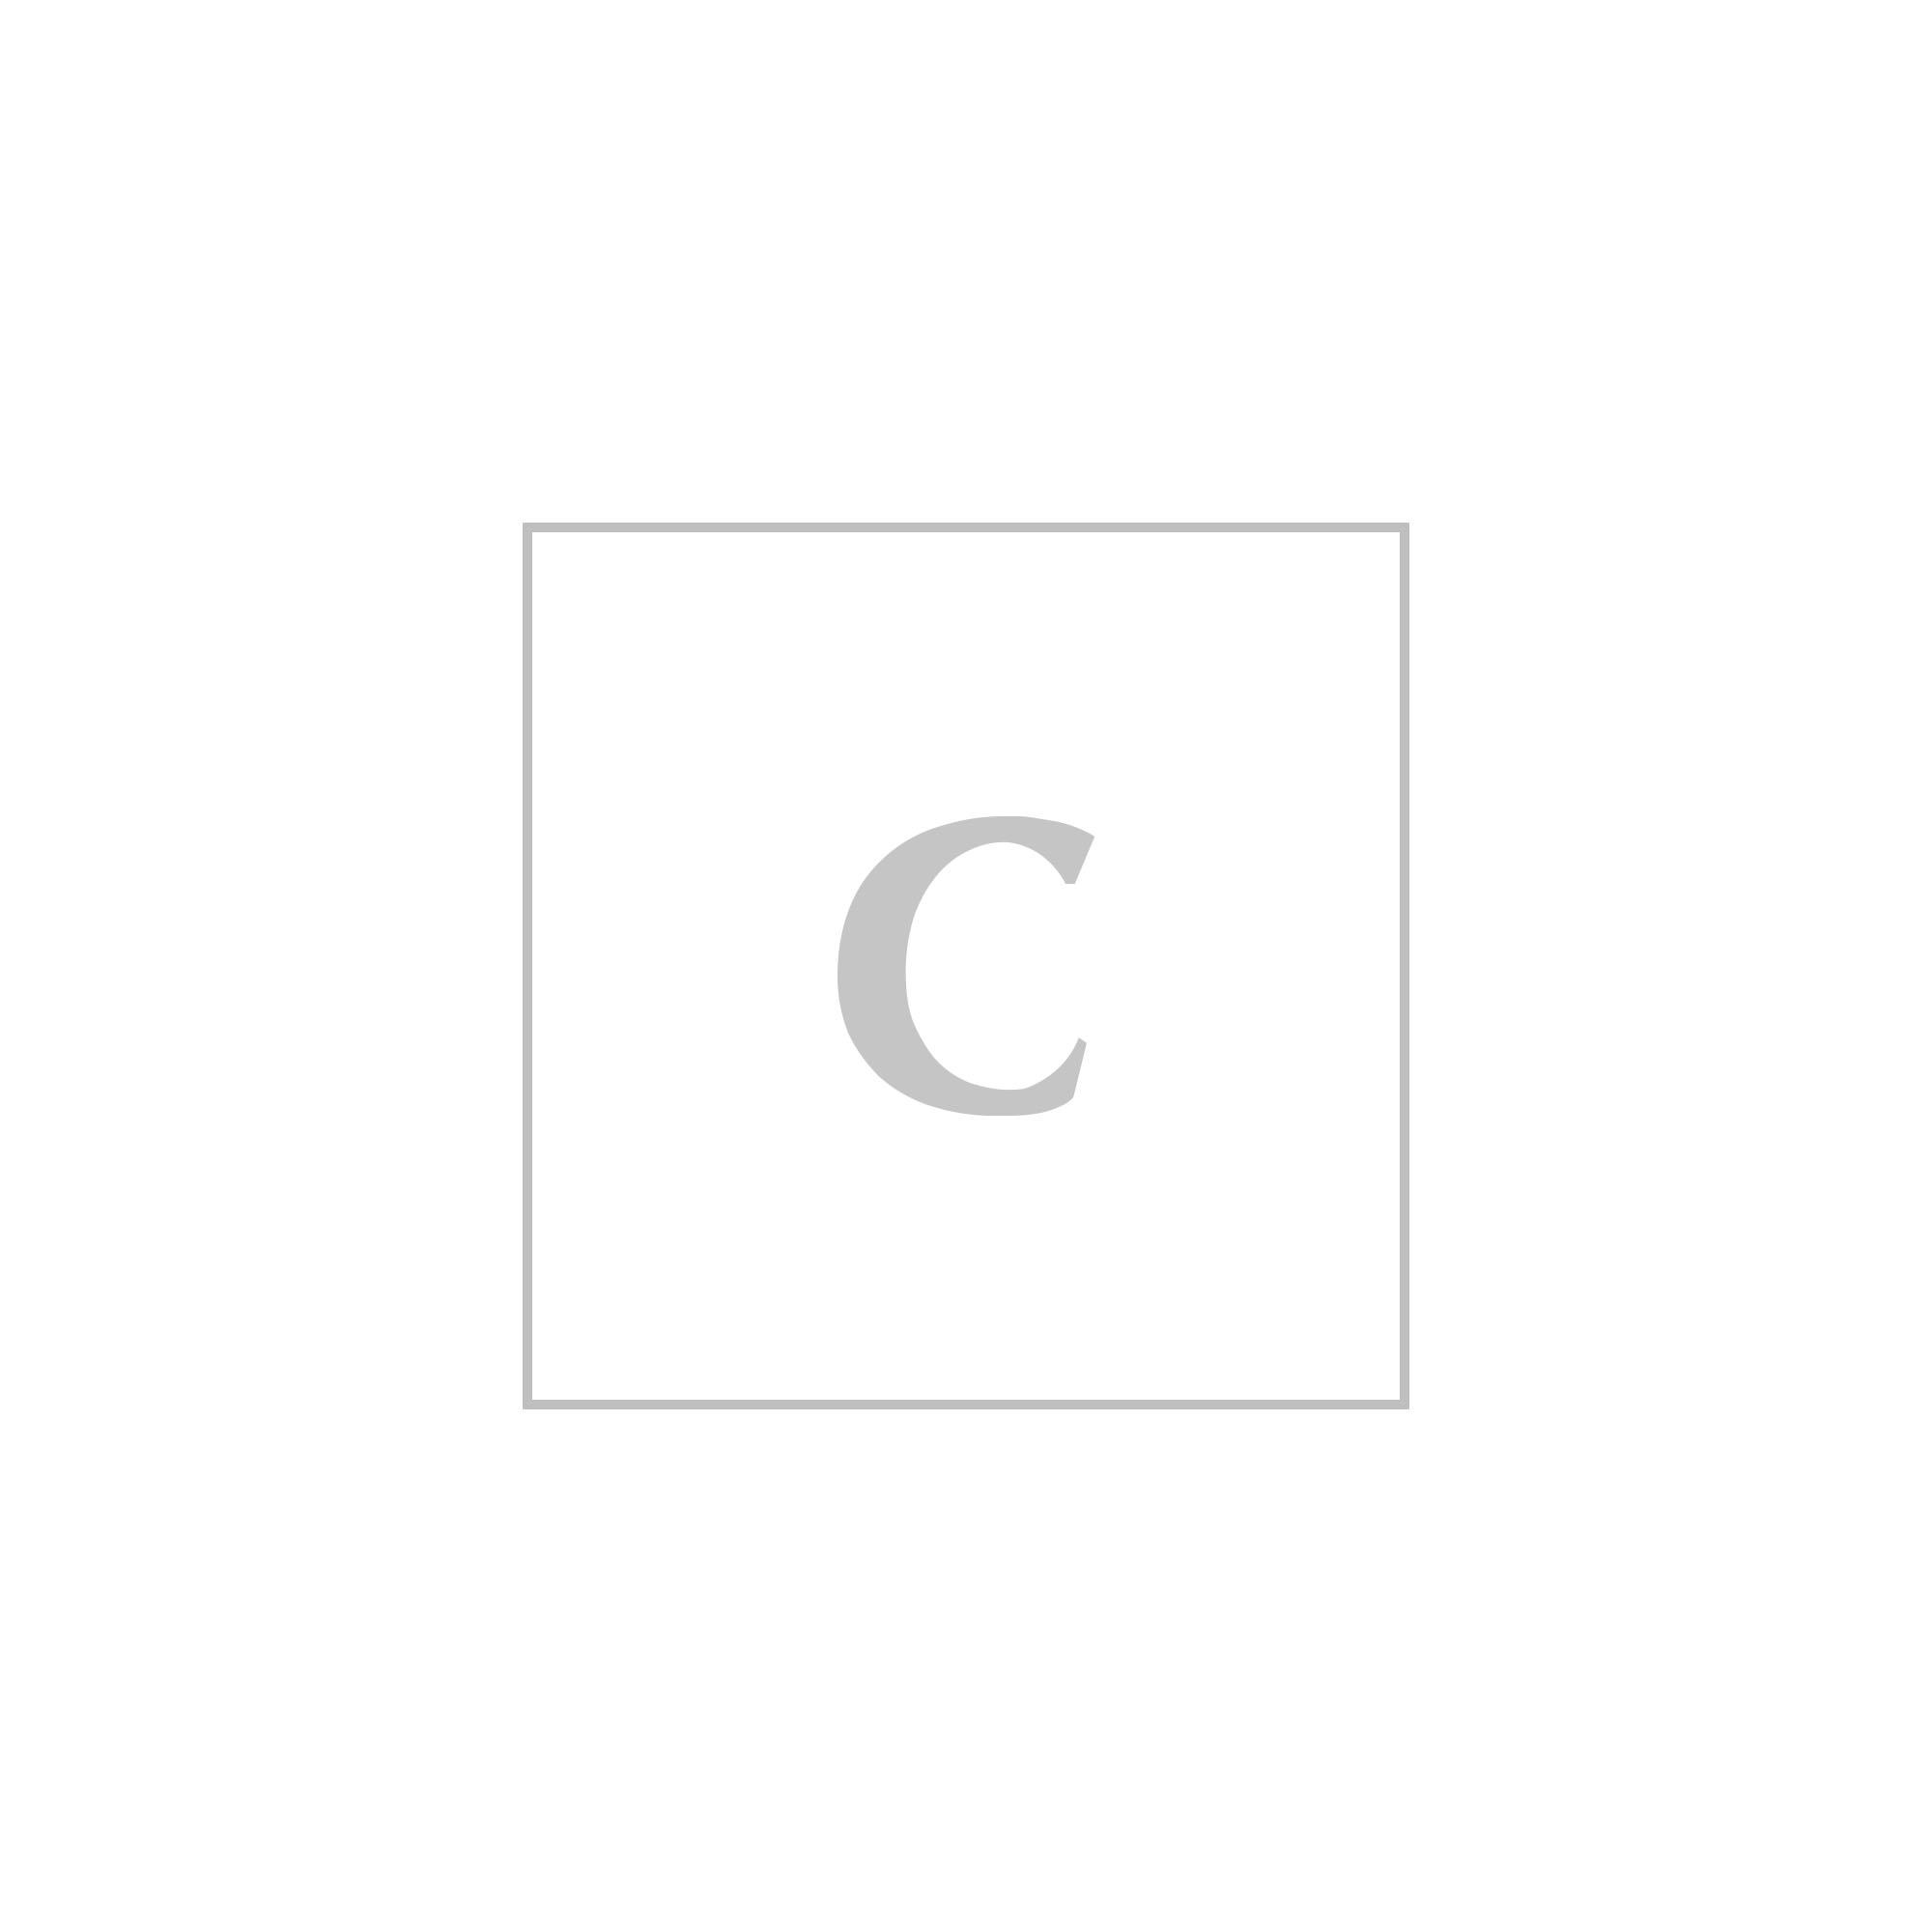 Saint laurent ysl monogram clutch